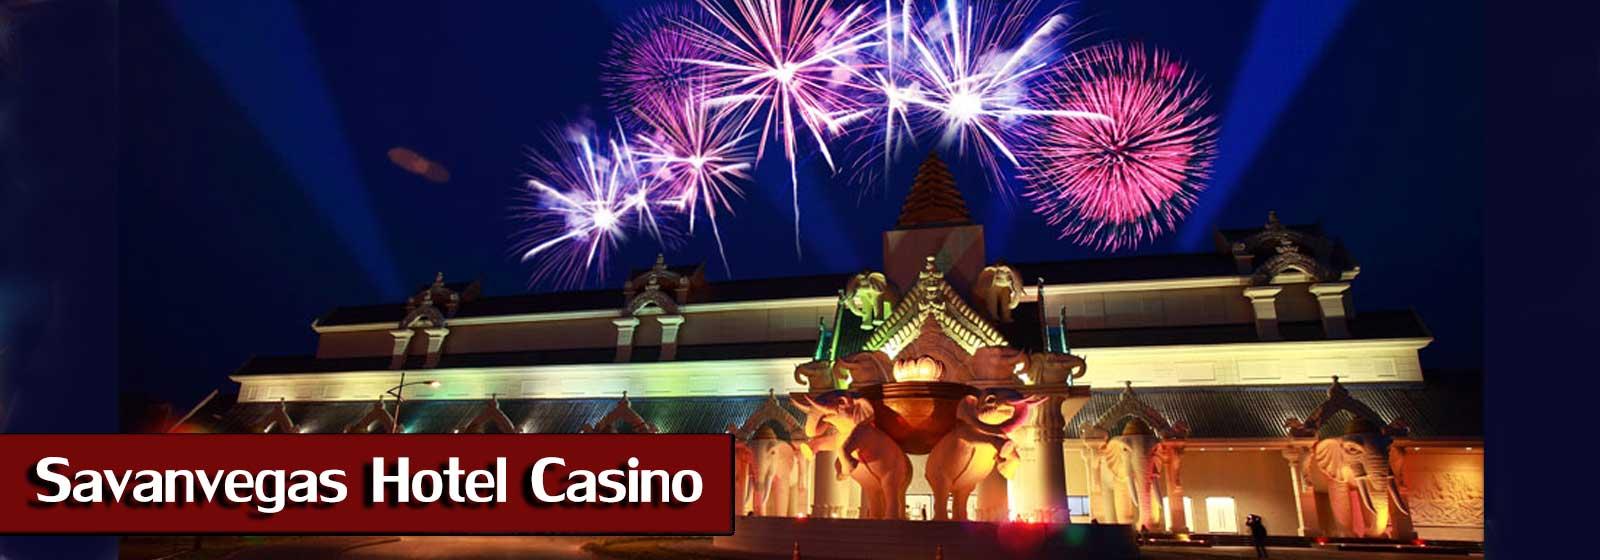 savanvegas-hotel-casino